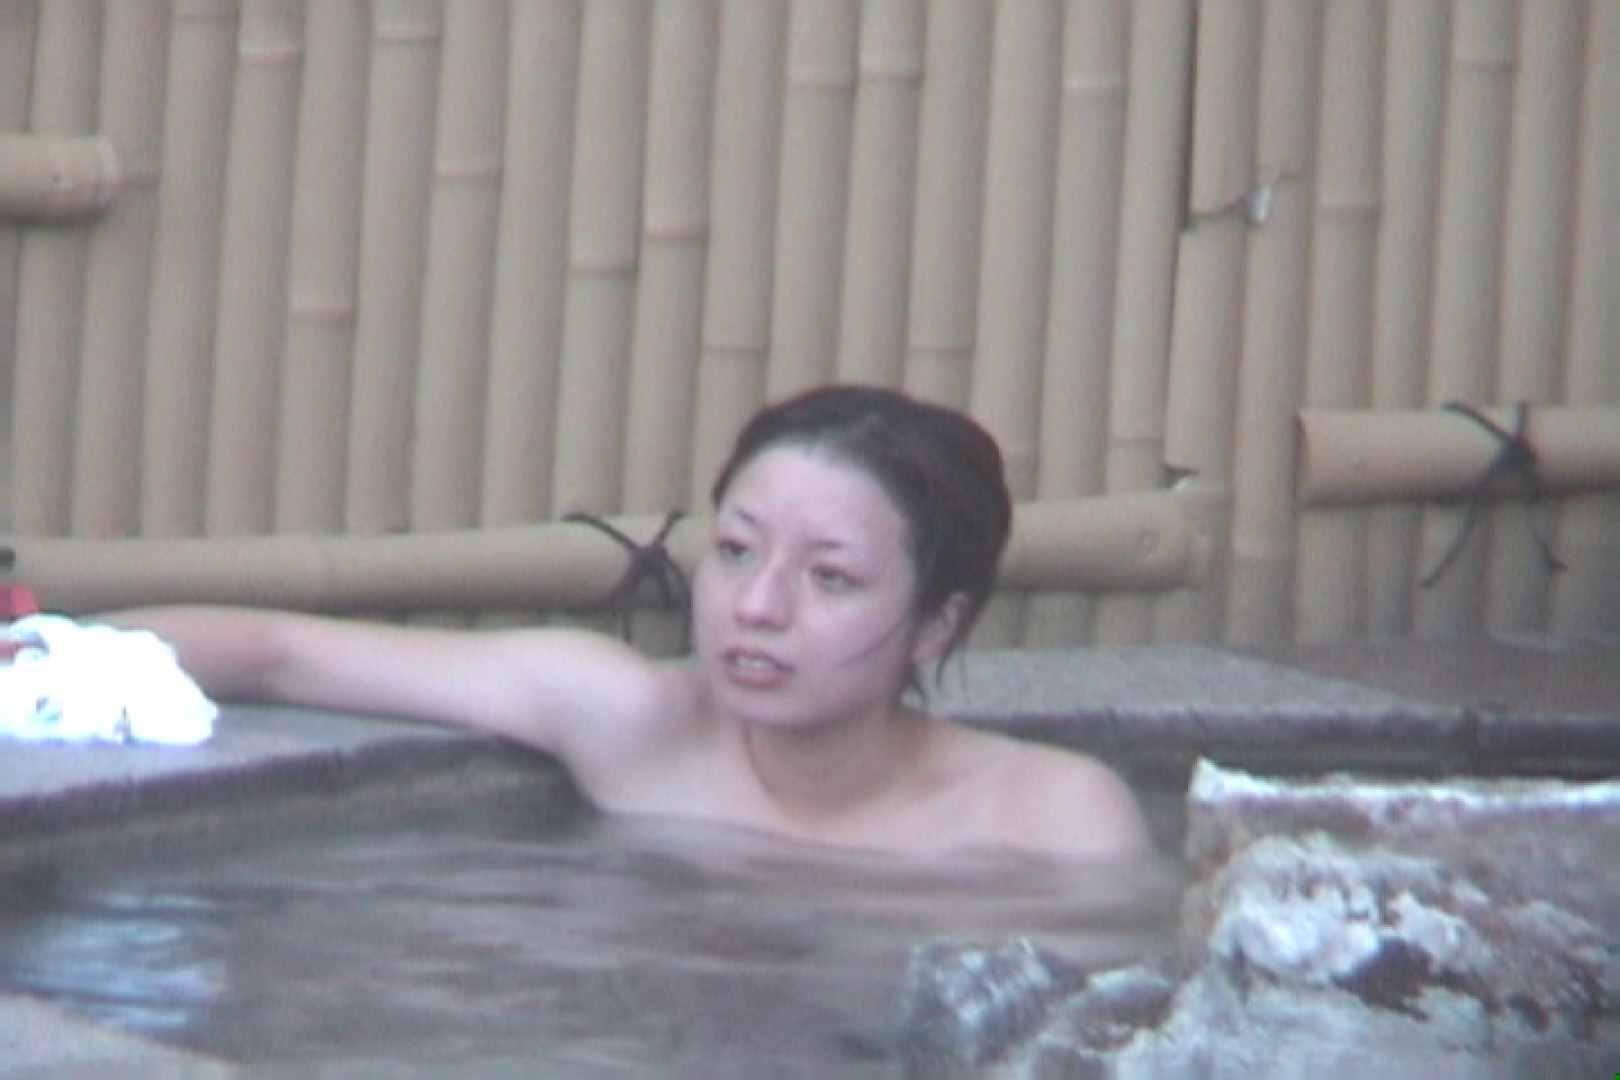 Aquaな露天風呂Vol.608 HなOL | 盗撮  89pic 42